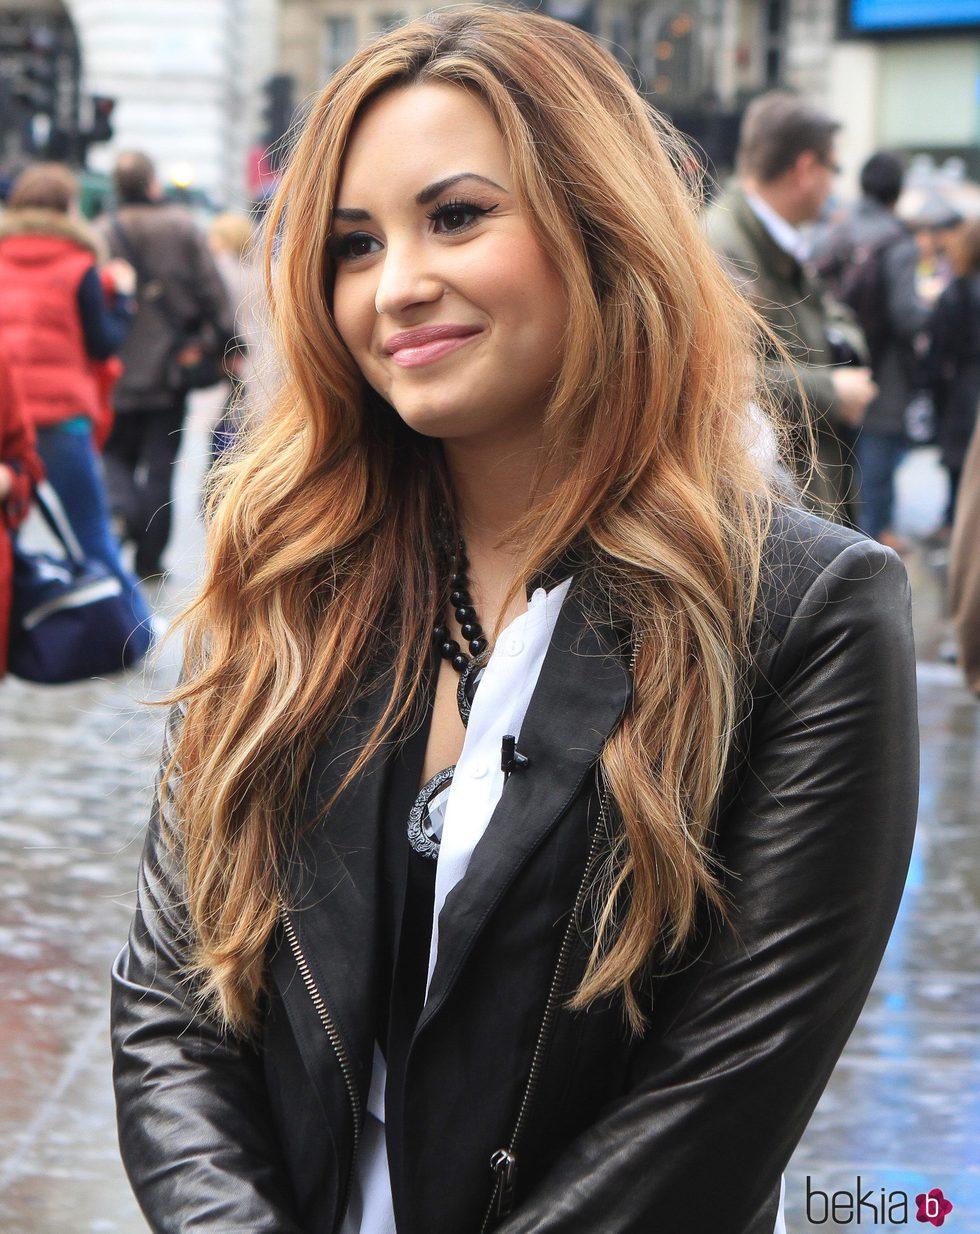 Demi Lovato Con Melena Larga Con Ondas Los Mejores Peinados De